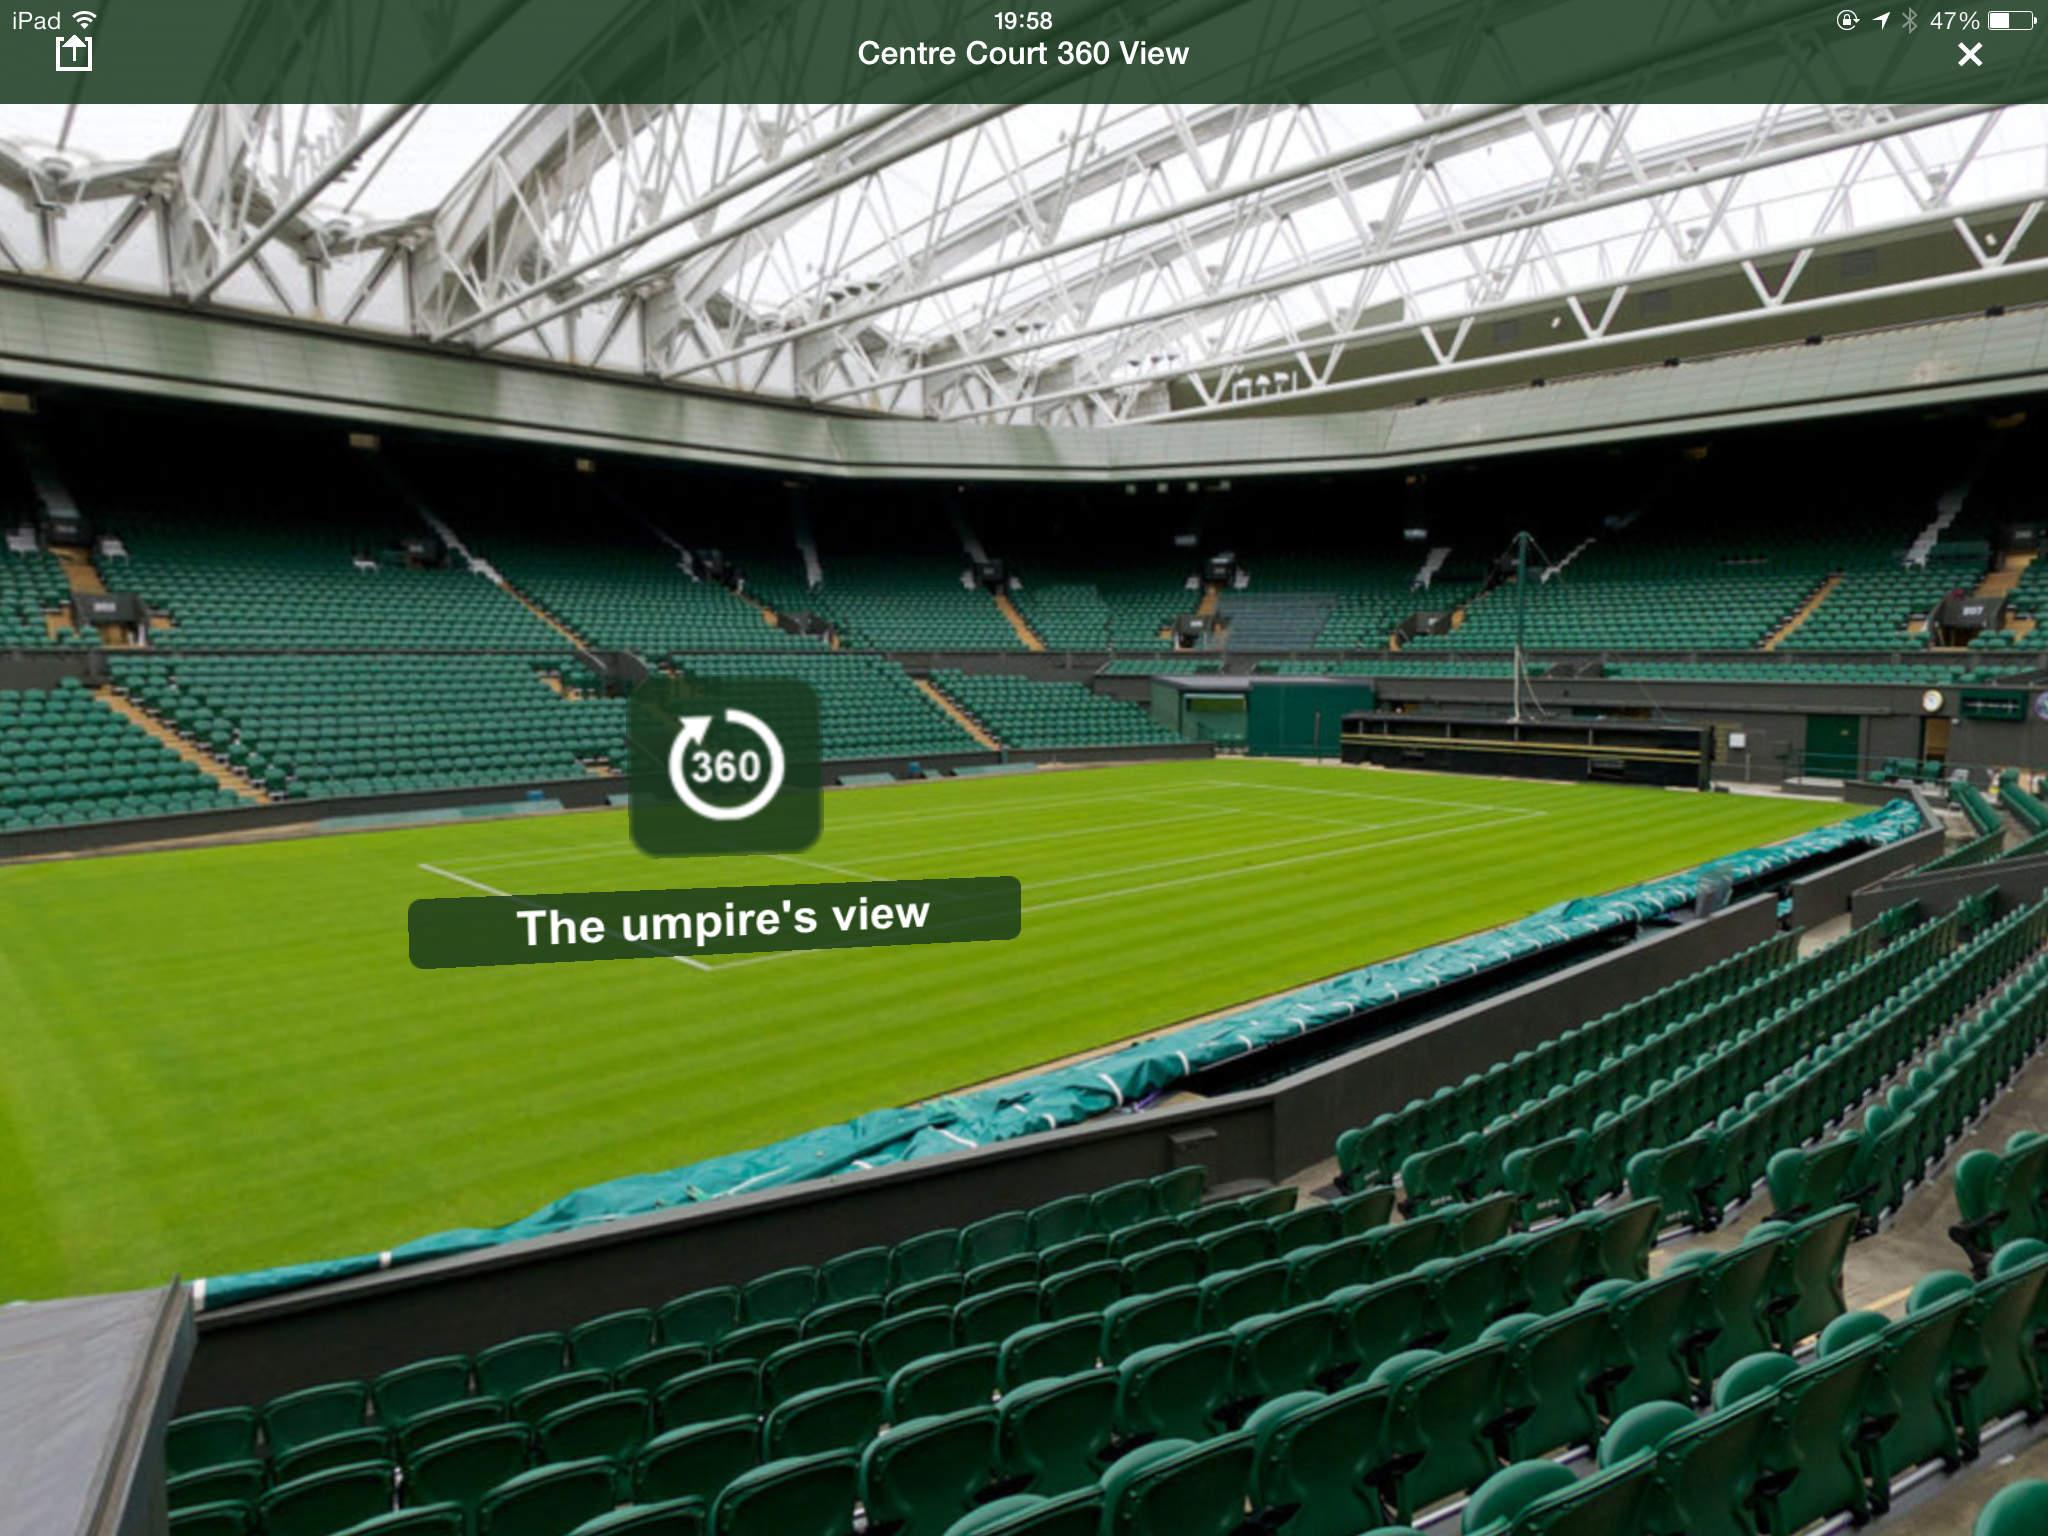 The Championships, Wimbledon 2015 - Grand Slam Tennis screenshot-3